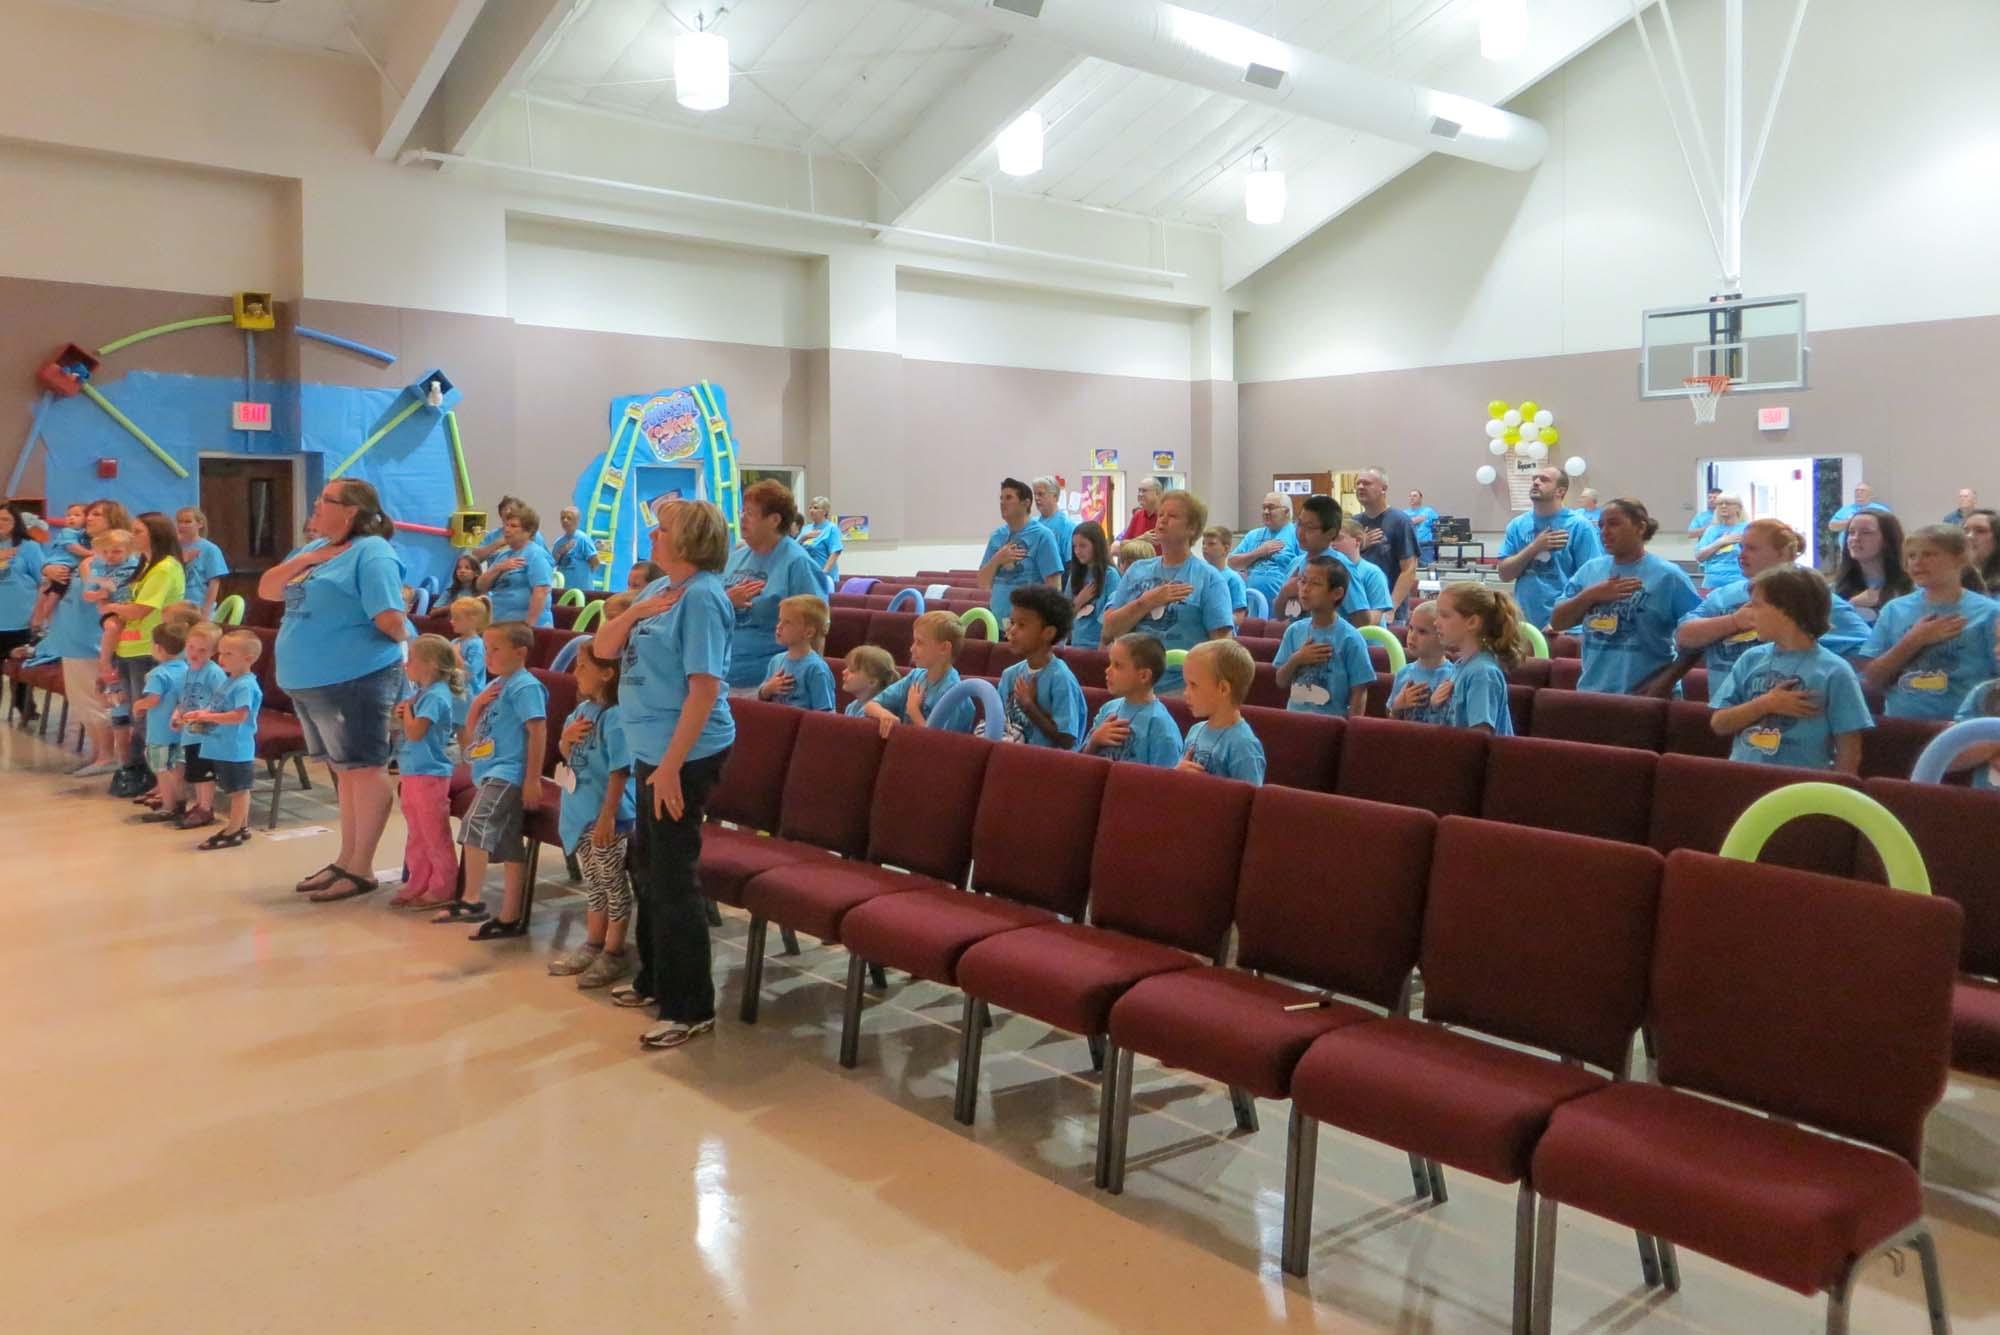 Windover-Baptist-Church-Addition-05.jpg